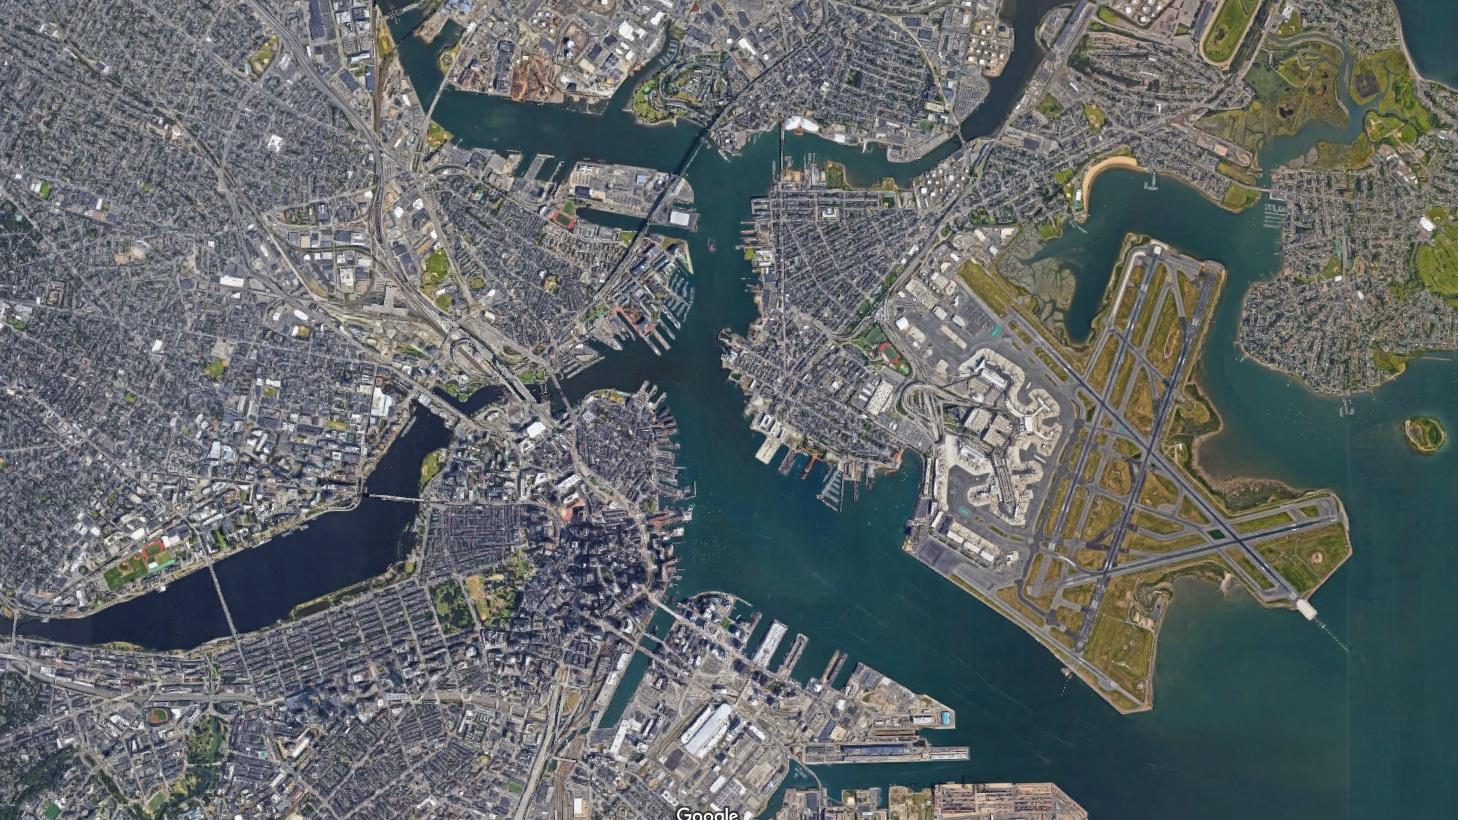 Map data: Google, TerraMetrics